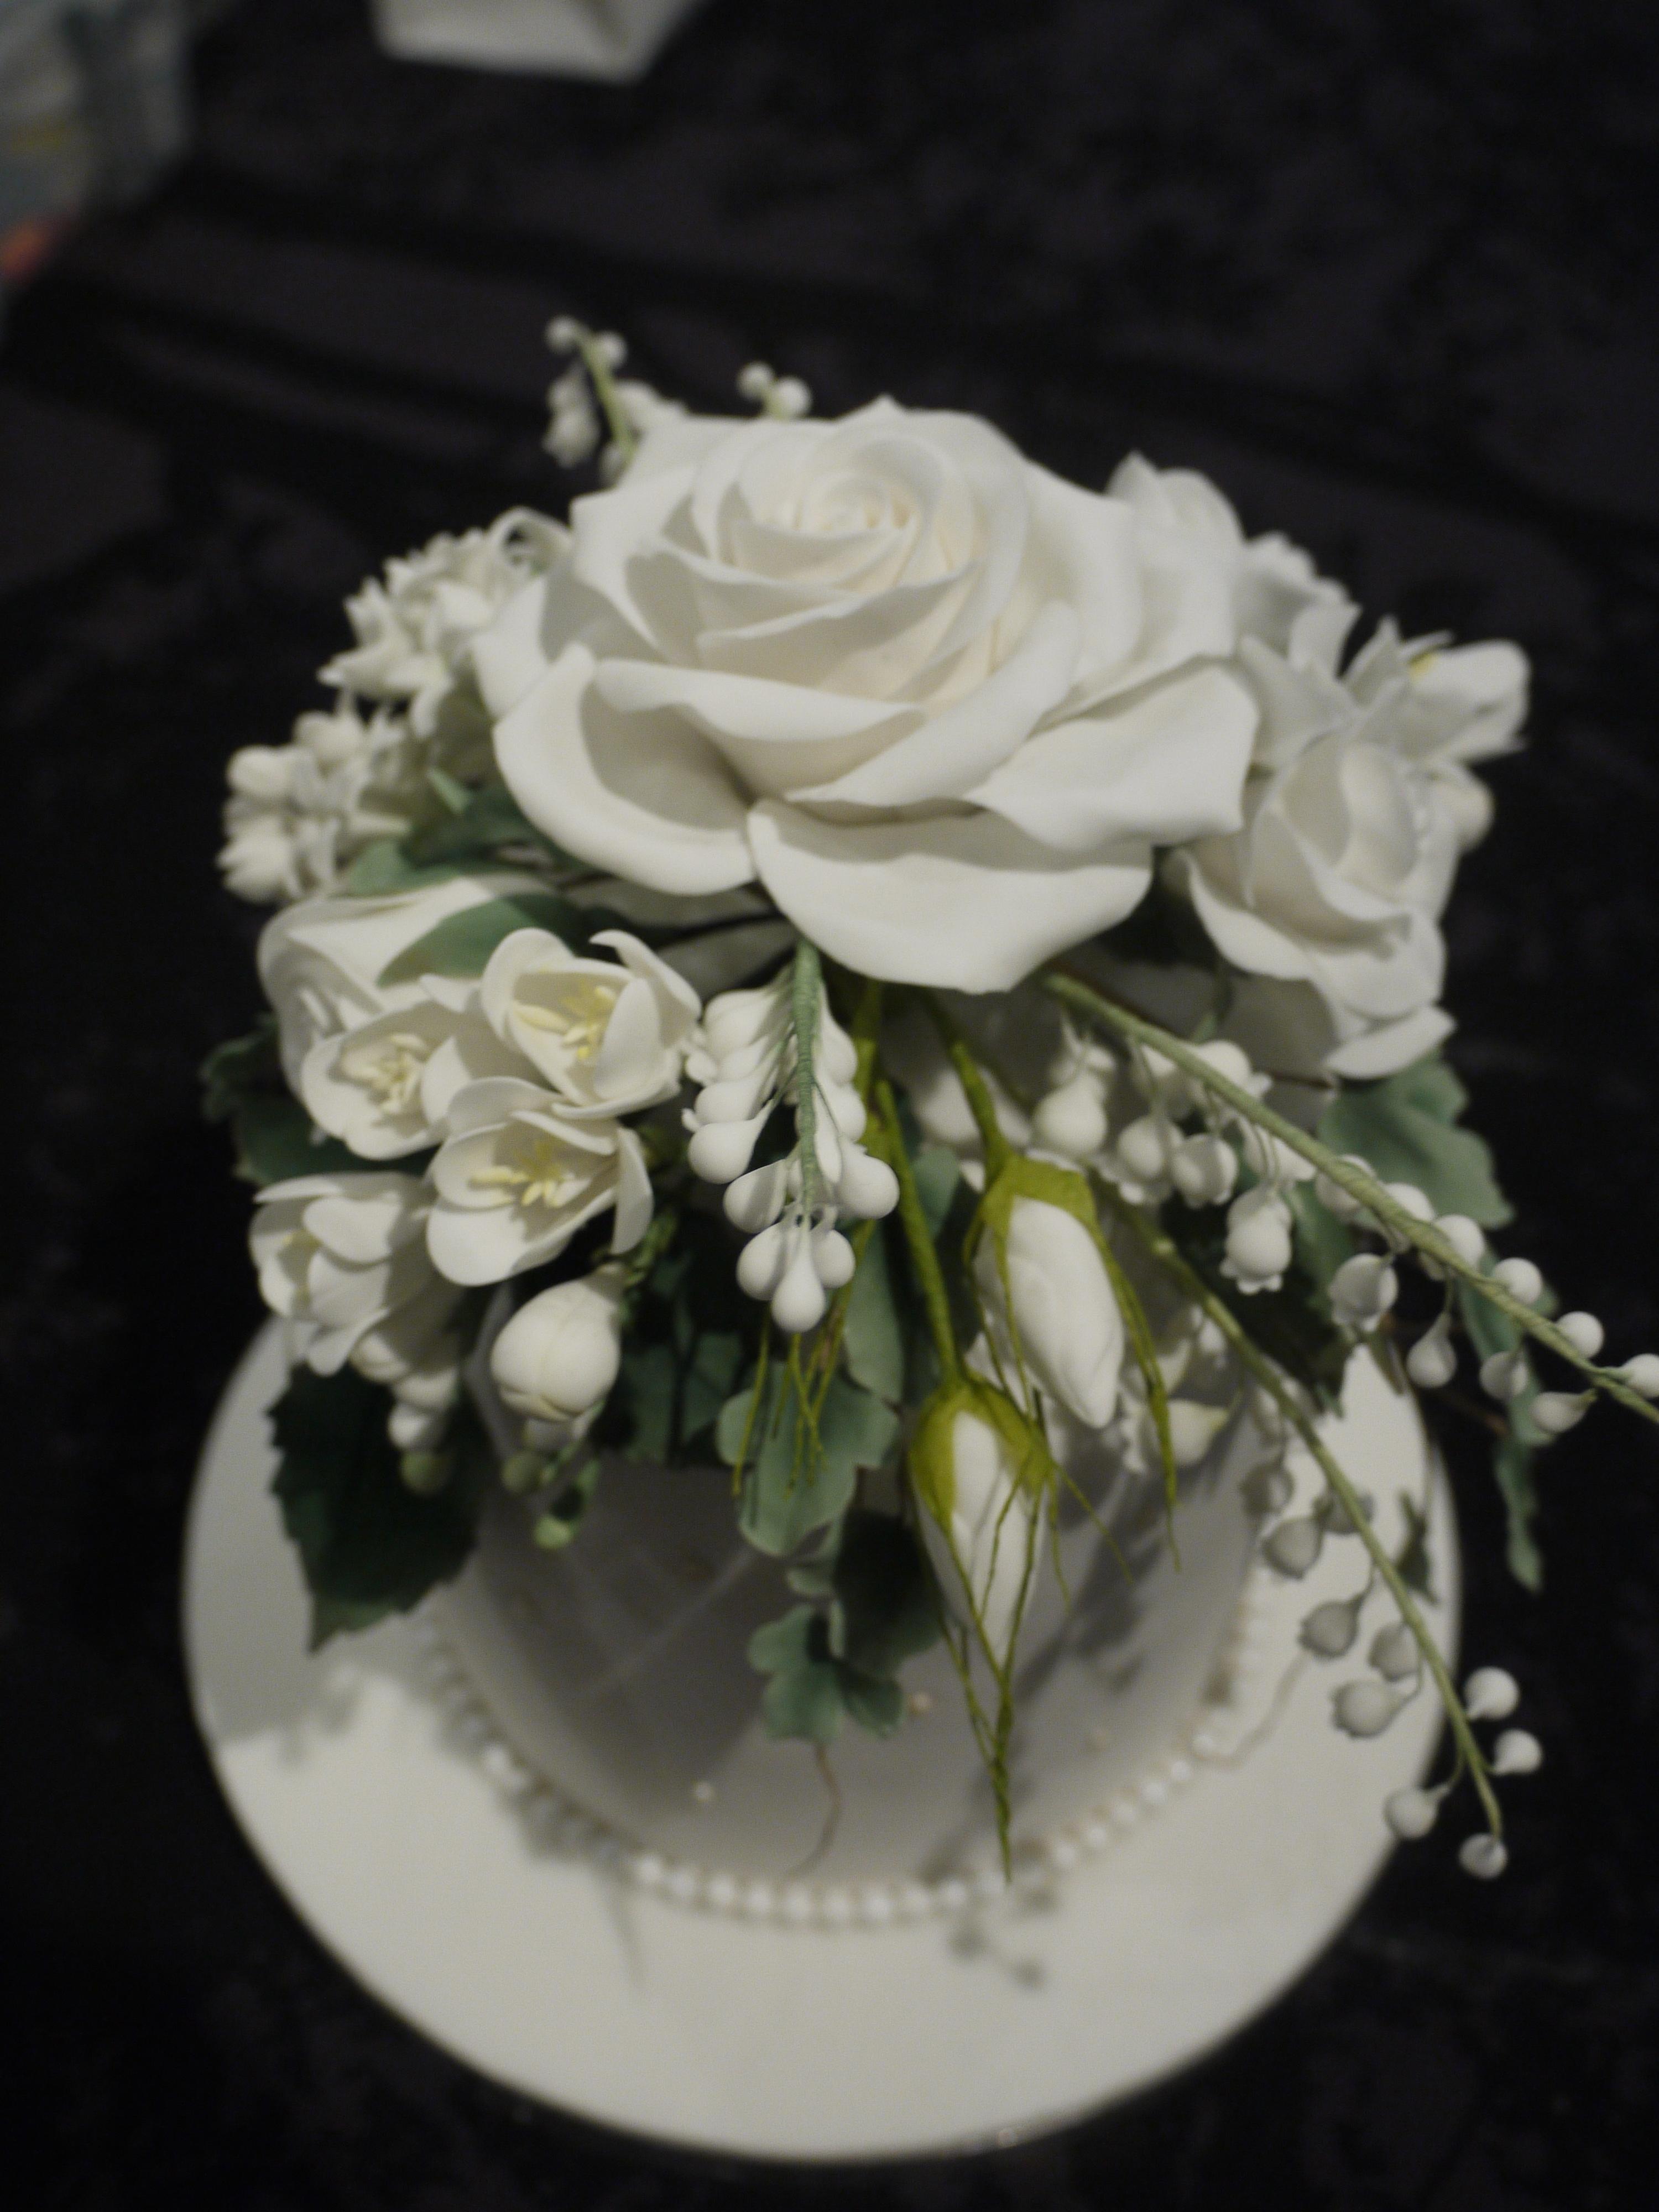 Sugar Flowers On Wedding Cake - CakeCentral.com